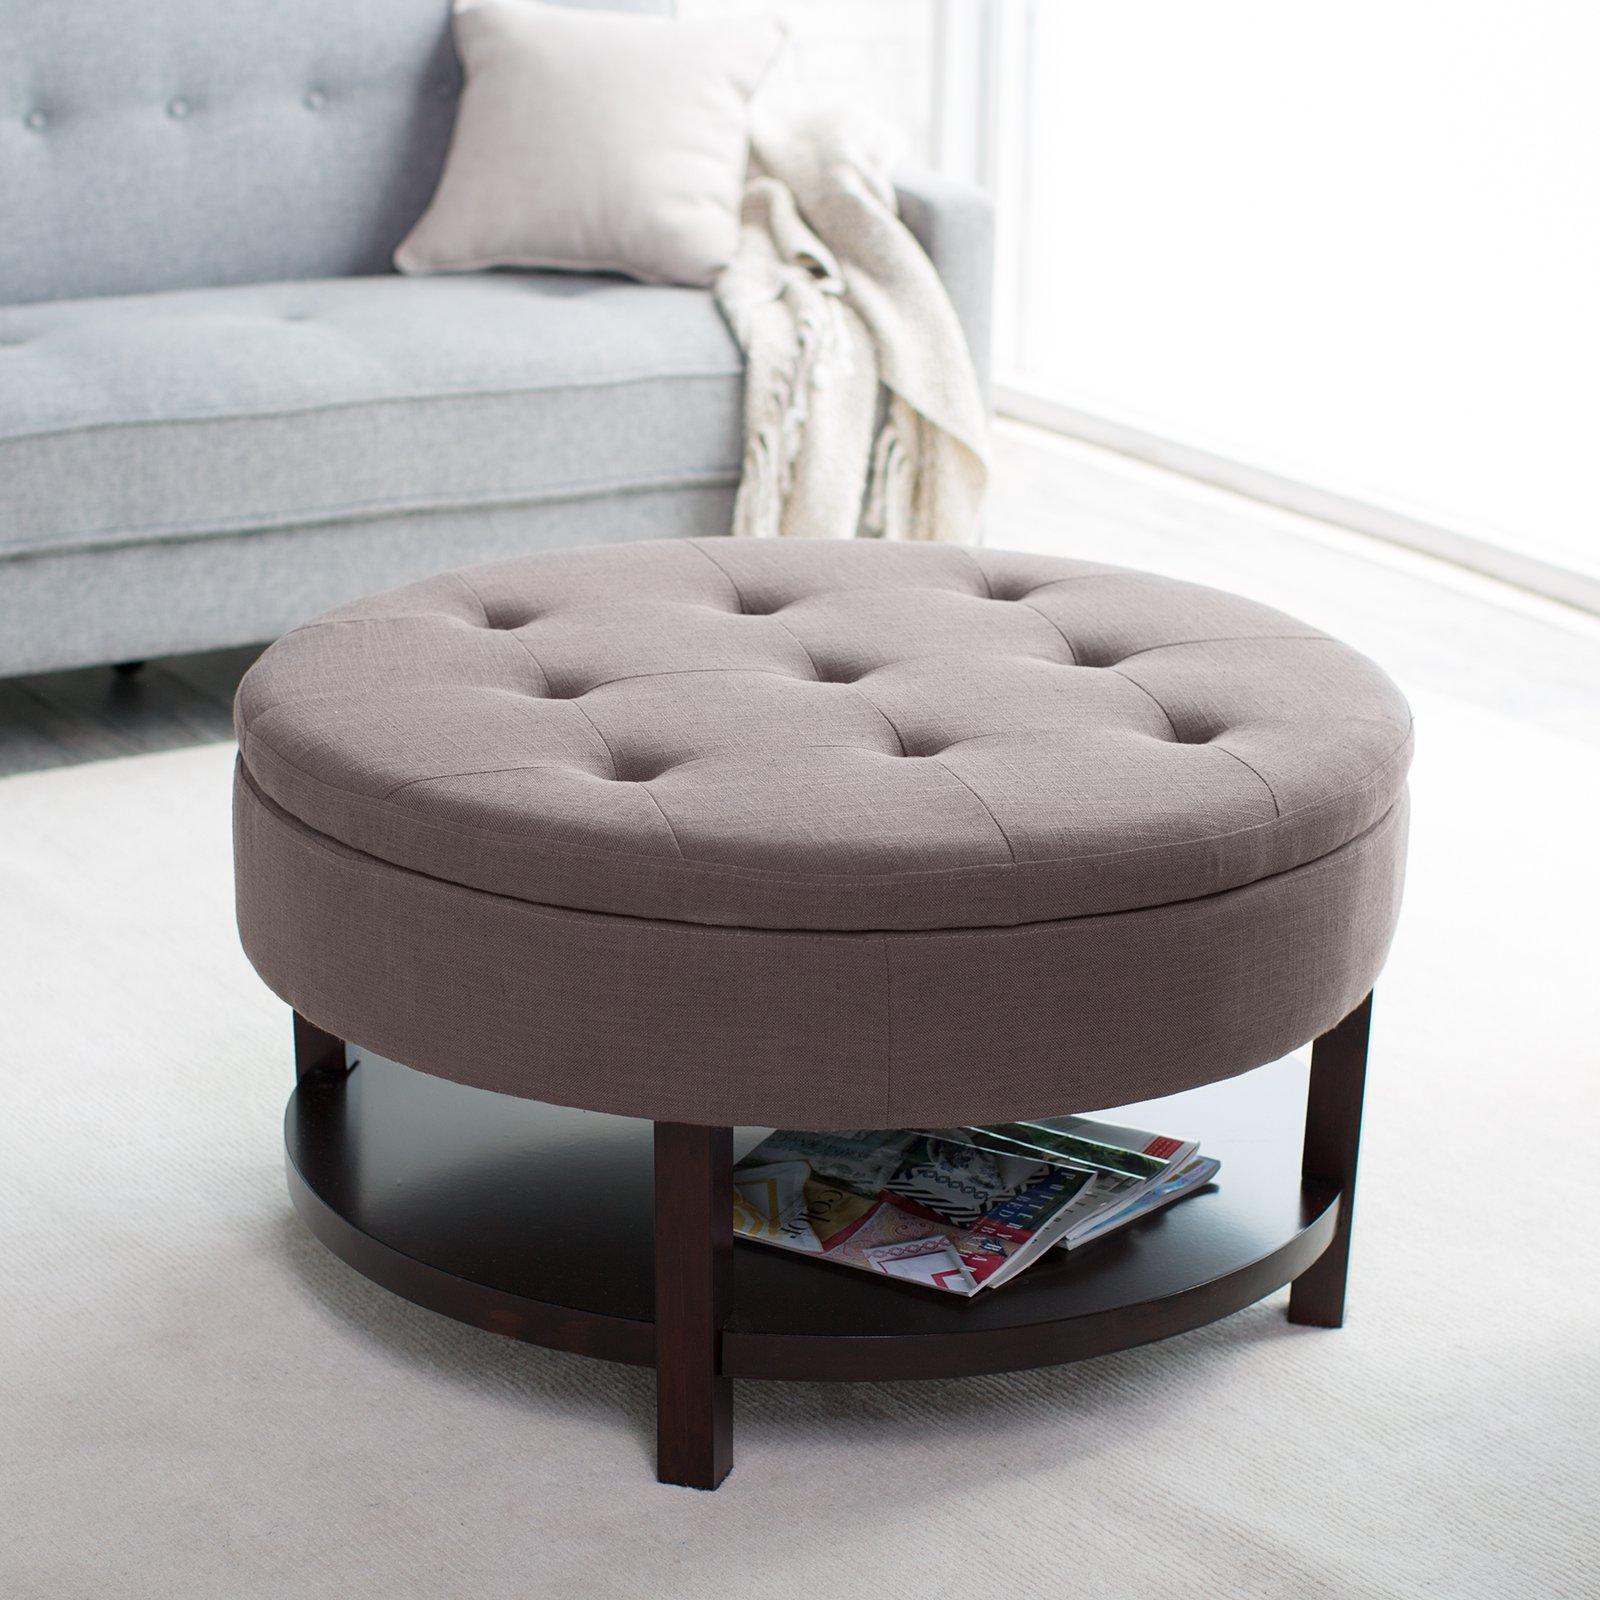 Round-Fabric-Ottoman-Coffee-Table.jpg